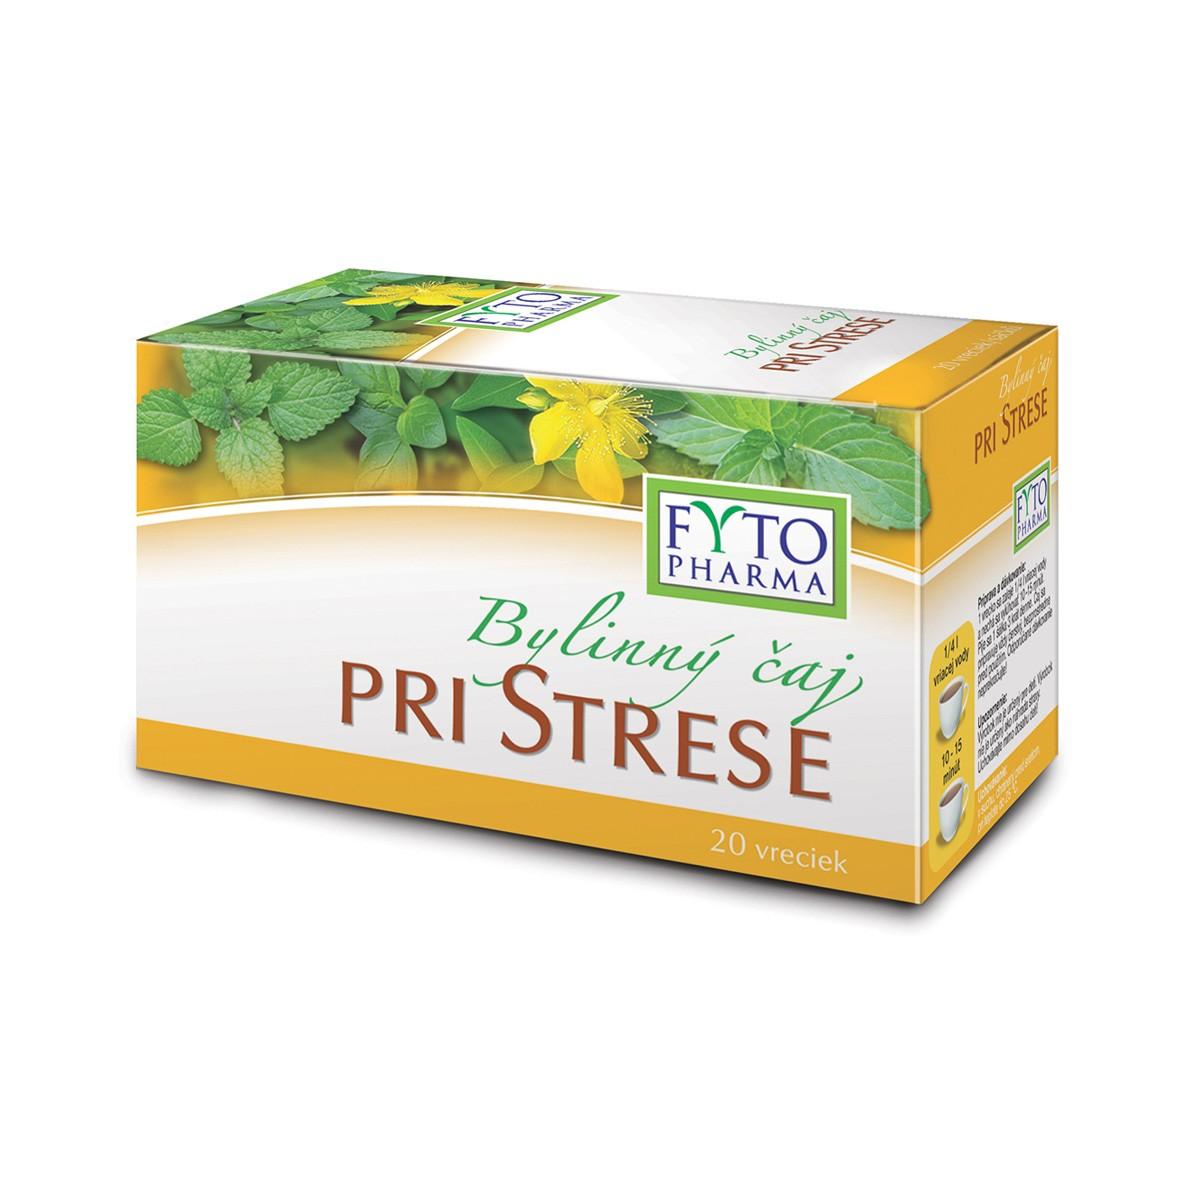 Čaj proti stresu 20x1g Fytopharma